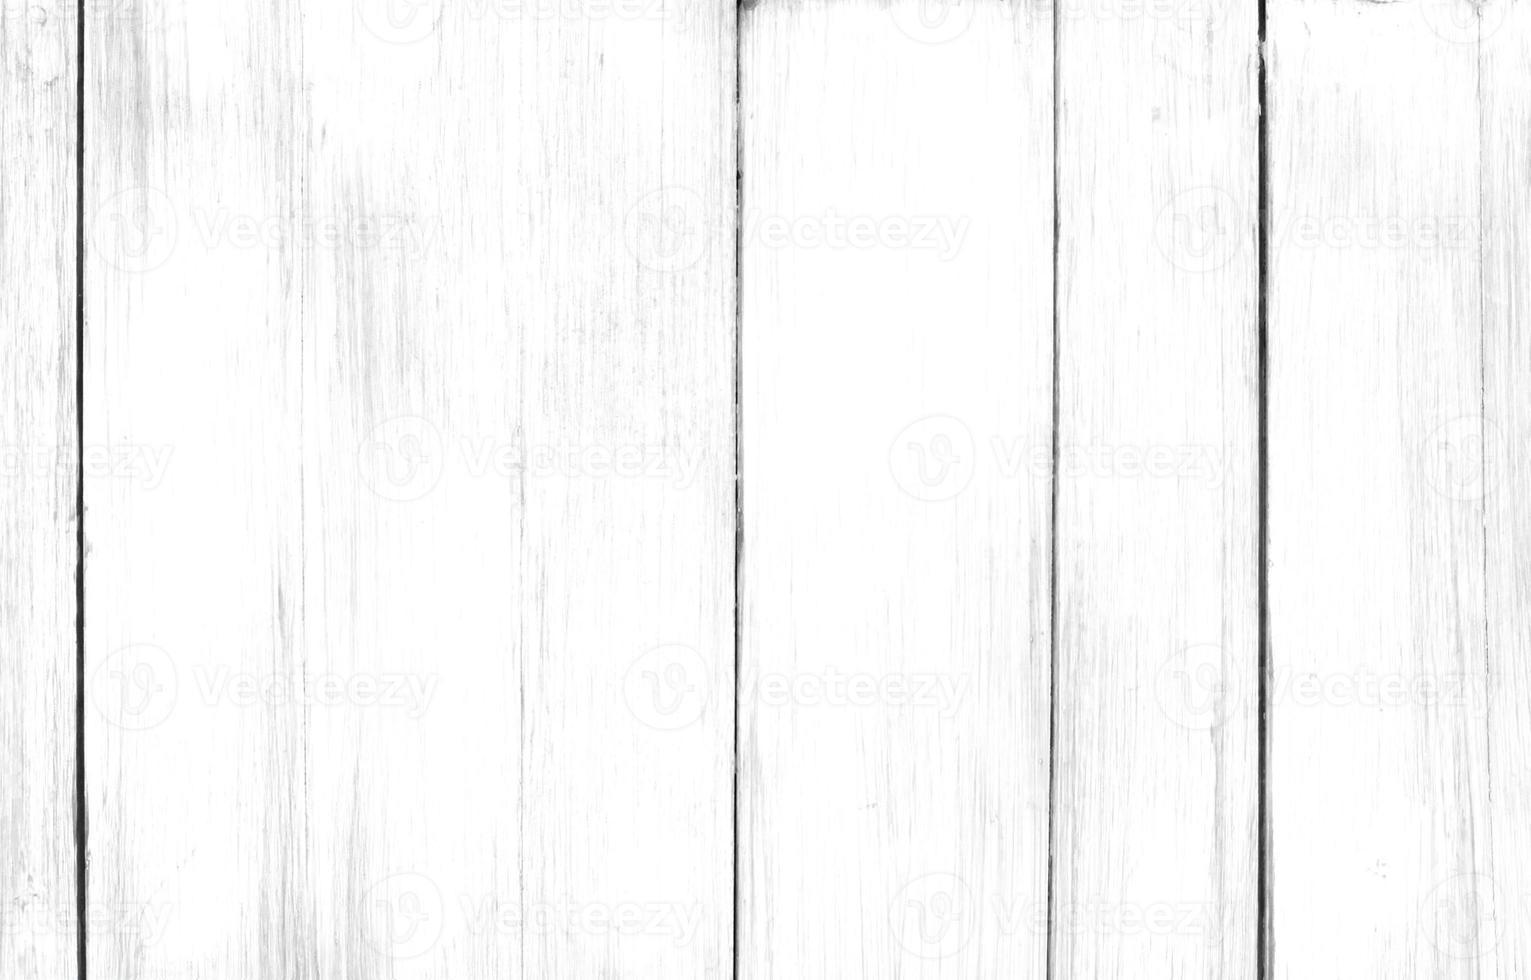 fond de mur en bois blanc photo